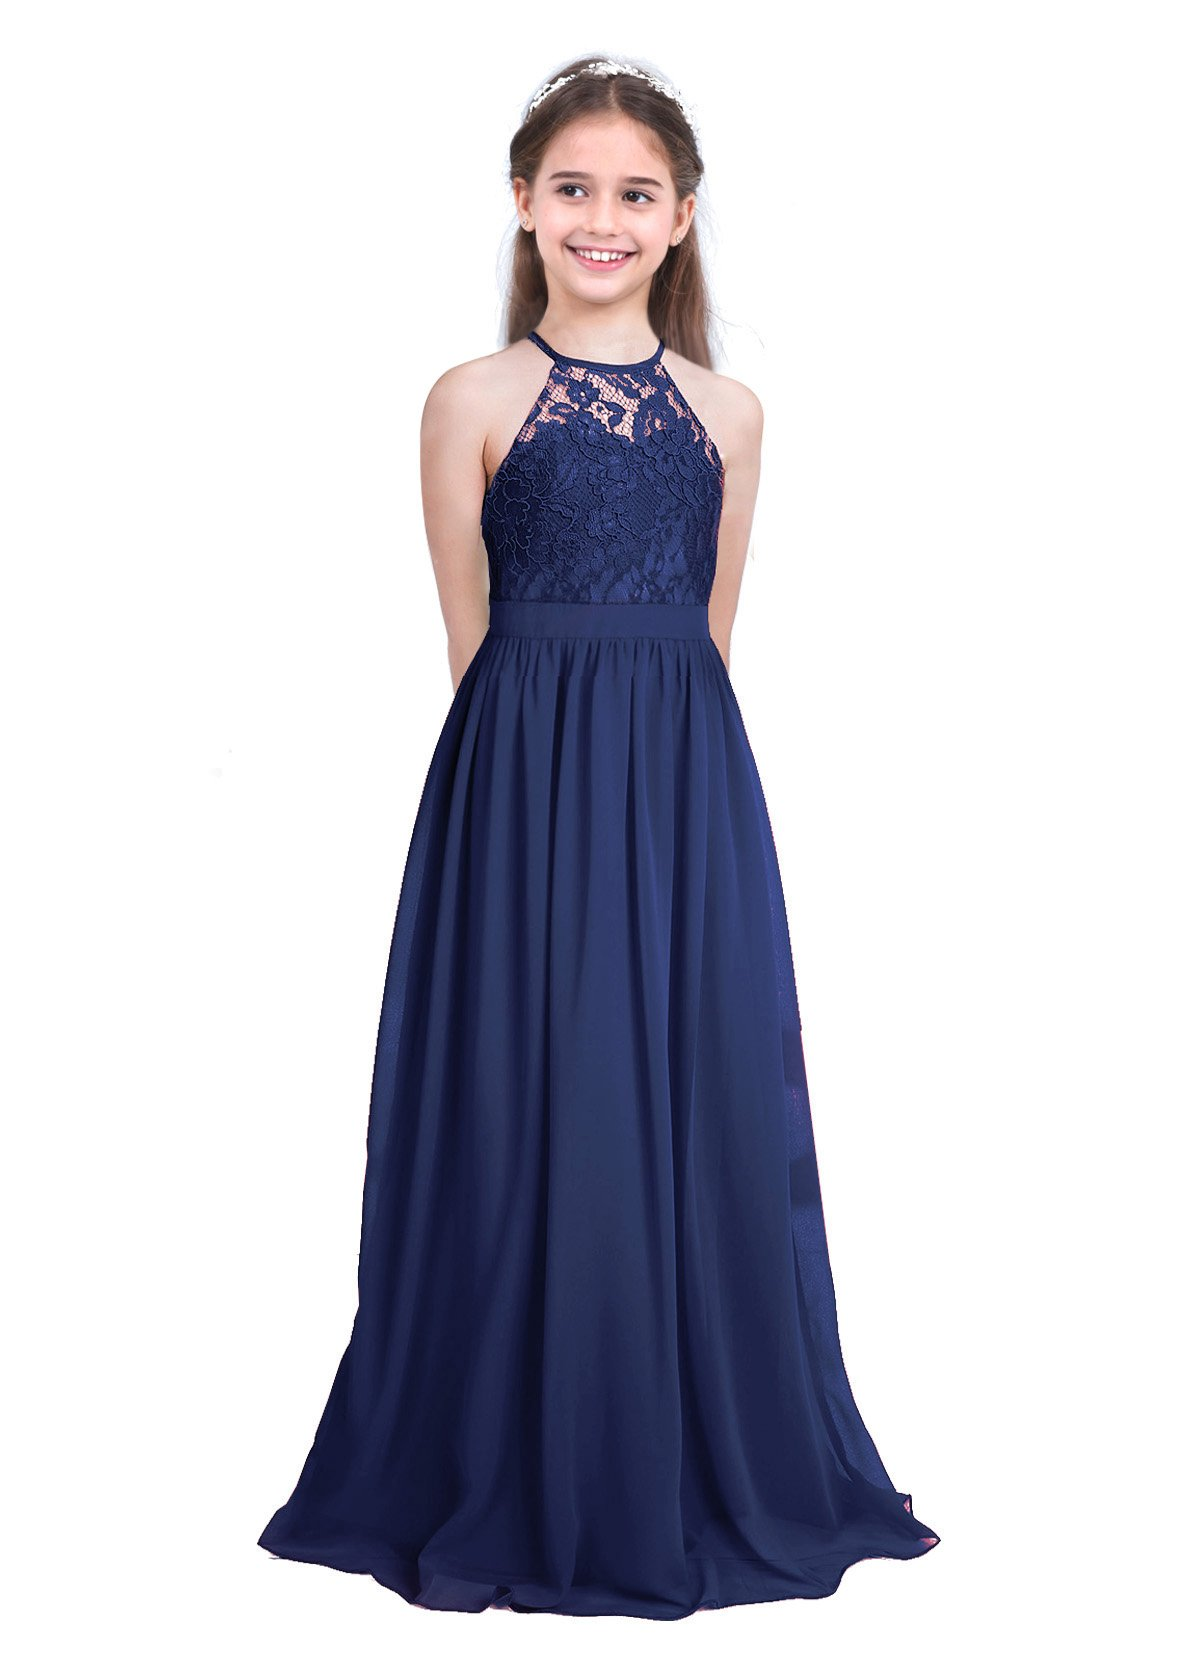 014cfed30d0f Galleon - MSemis Girls  Princess Halter Neck Floor-Length Lace ...